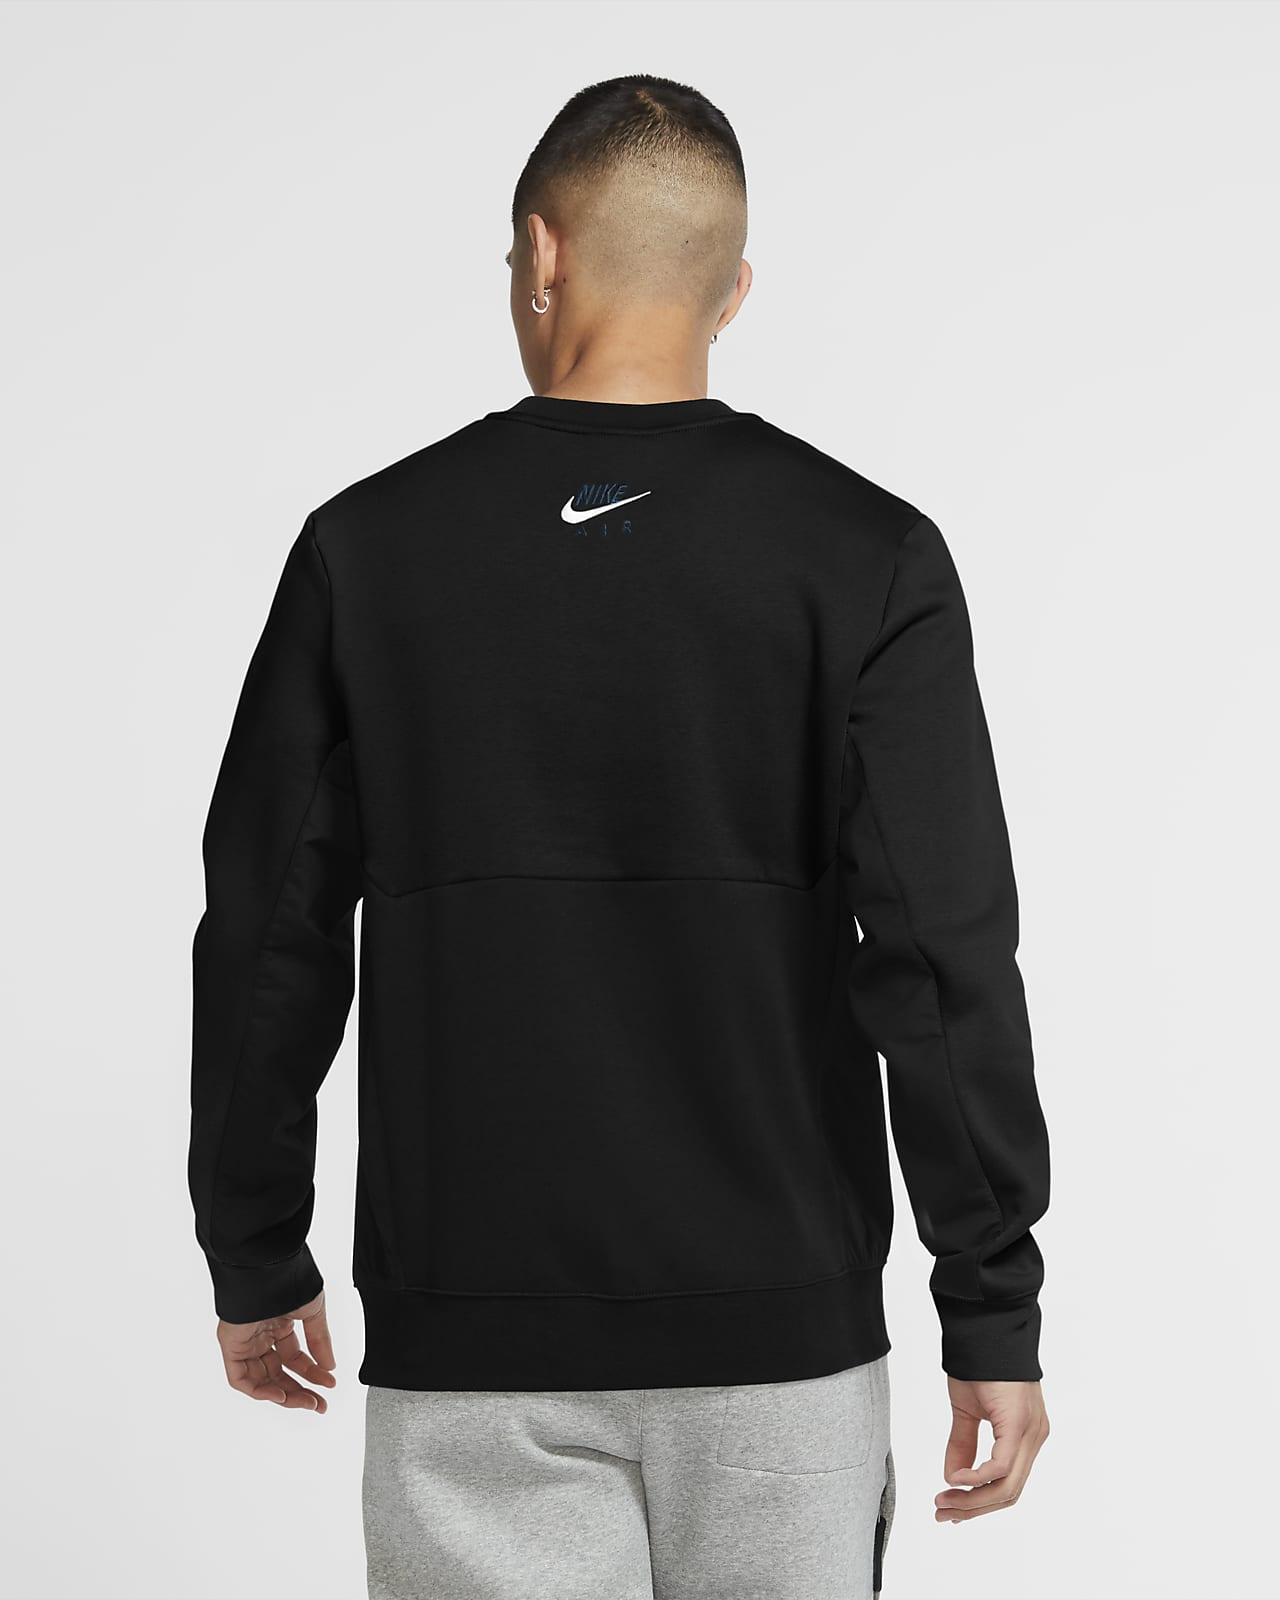 Nike Air Men's Fleece Crew. Nike CH